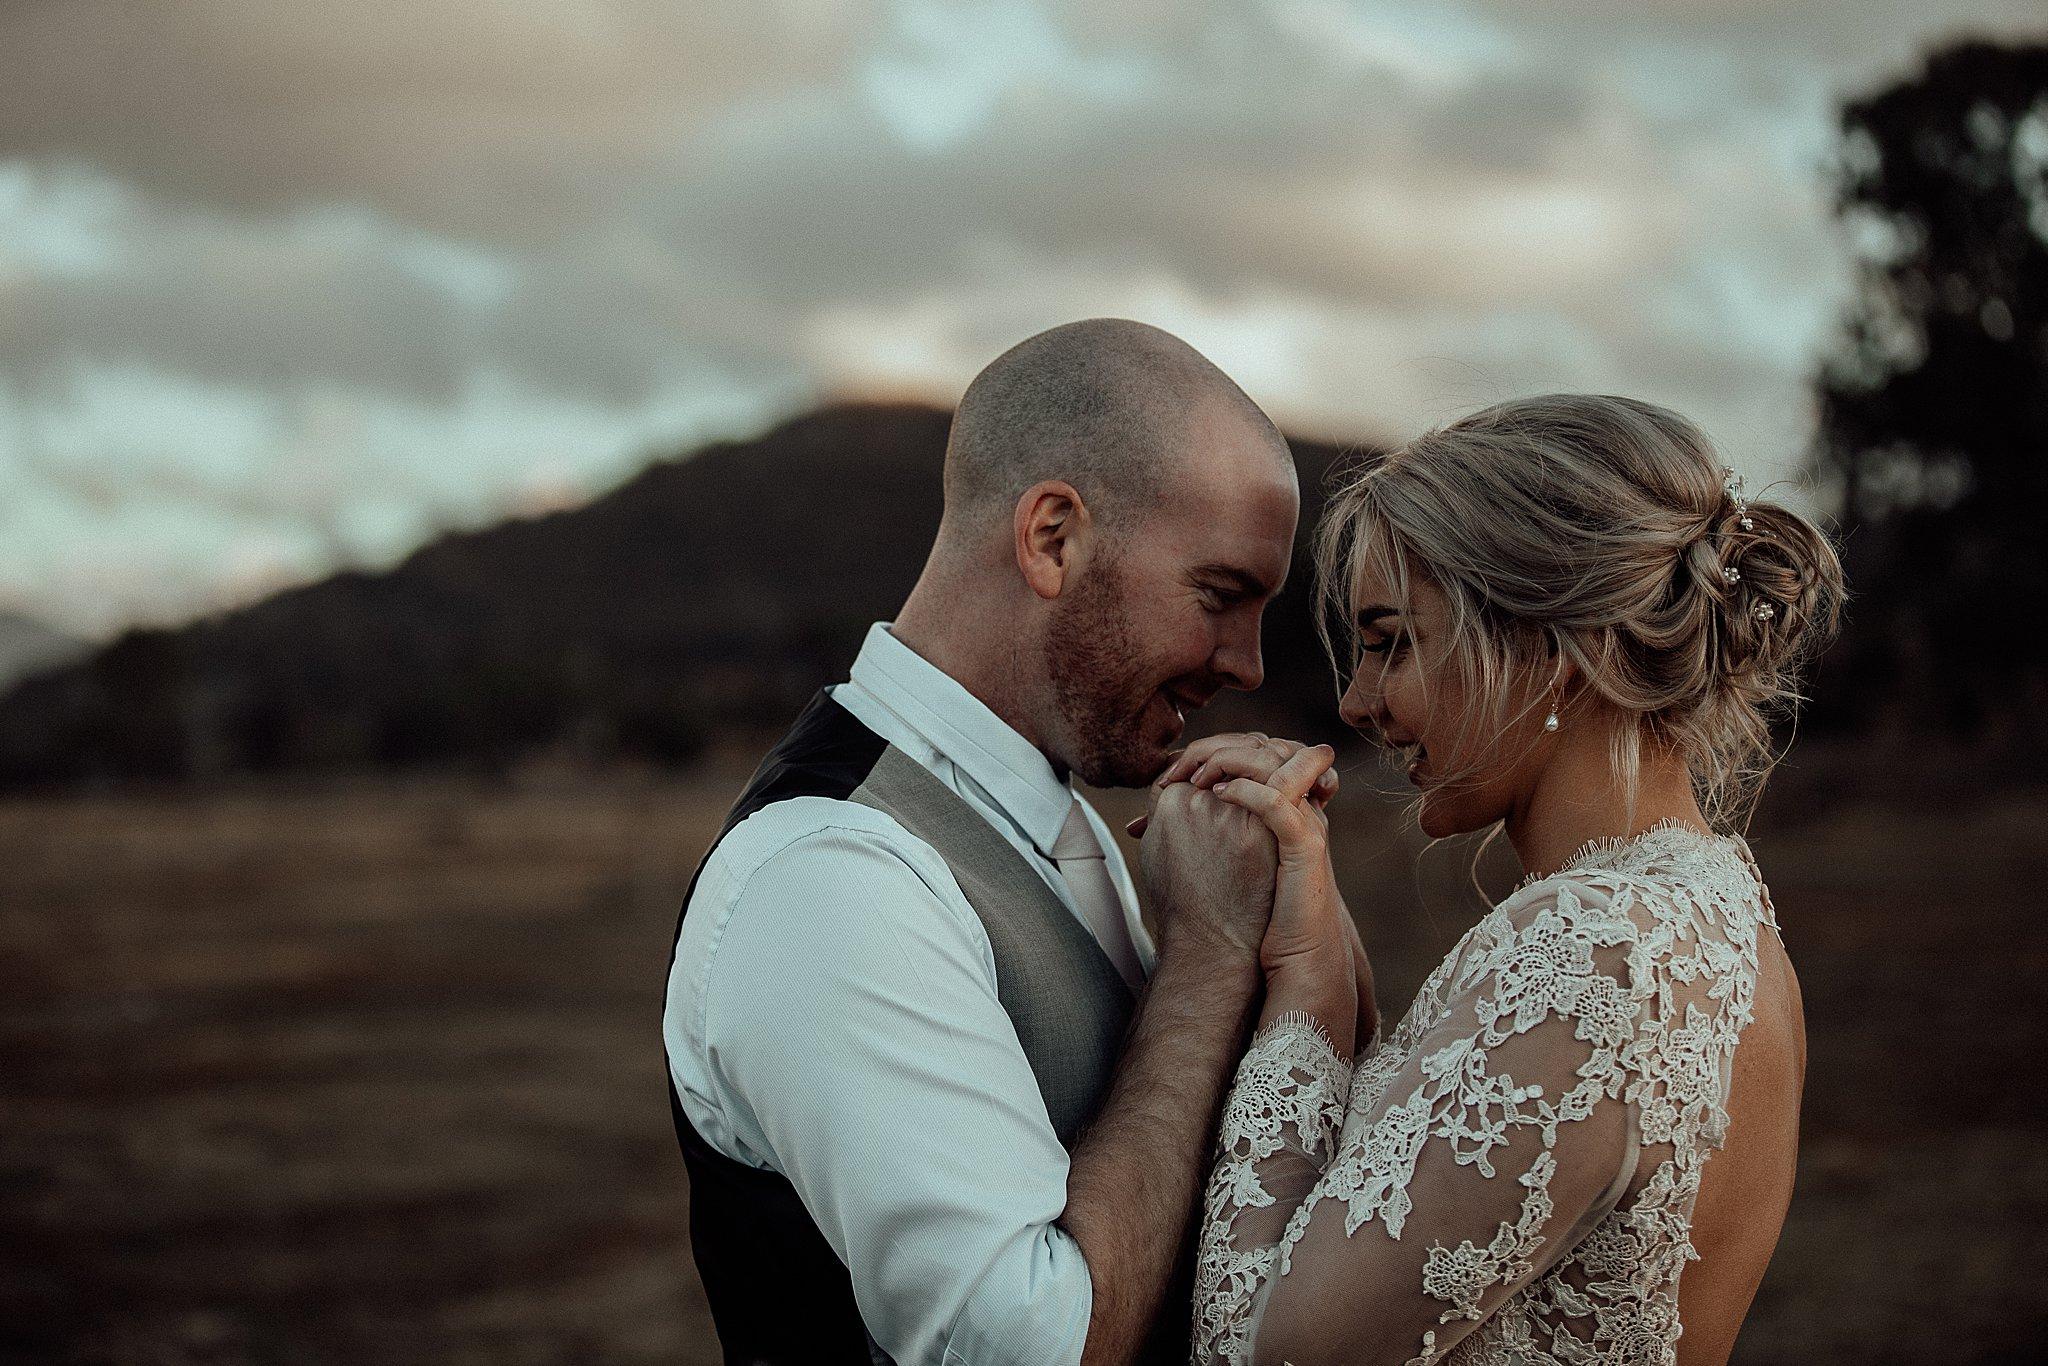 mickalathomas_puremacphotography_weddingphotographer_couplephotographer_Sheppartonphotographer_3381.jpg